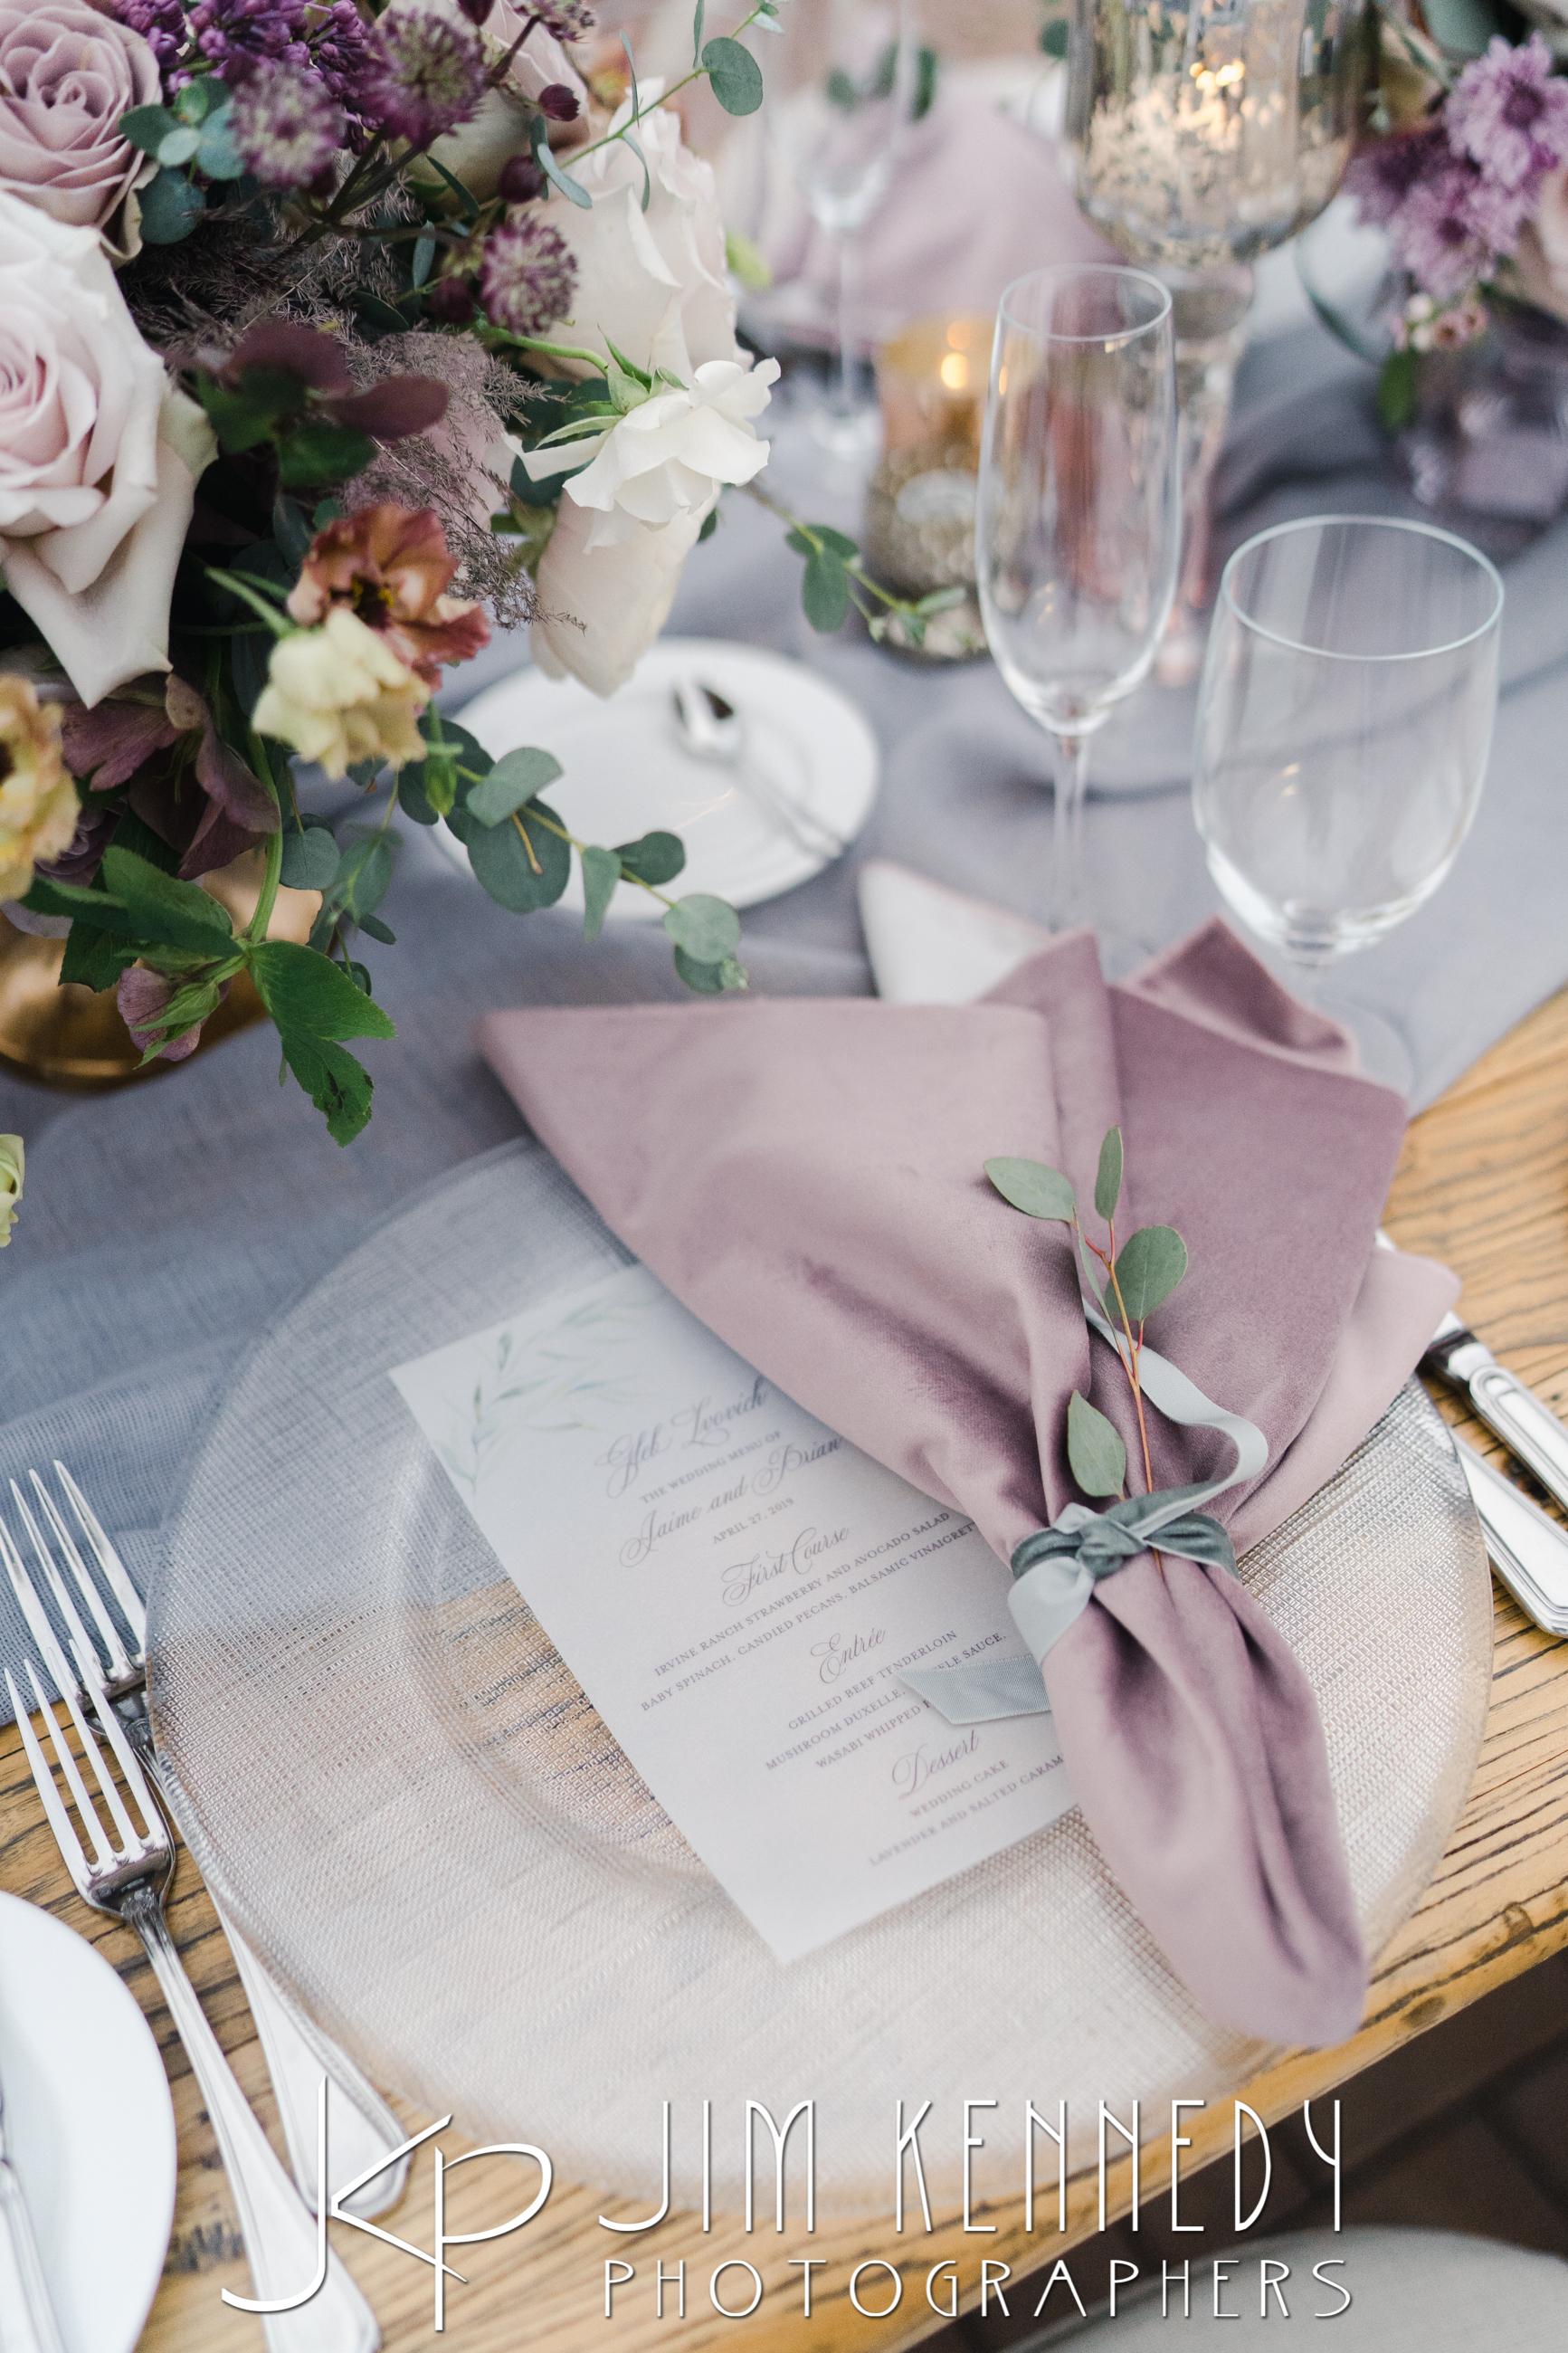 pelican-hill-wedding-jim-kenedy-photographers_0196.JPG